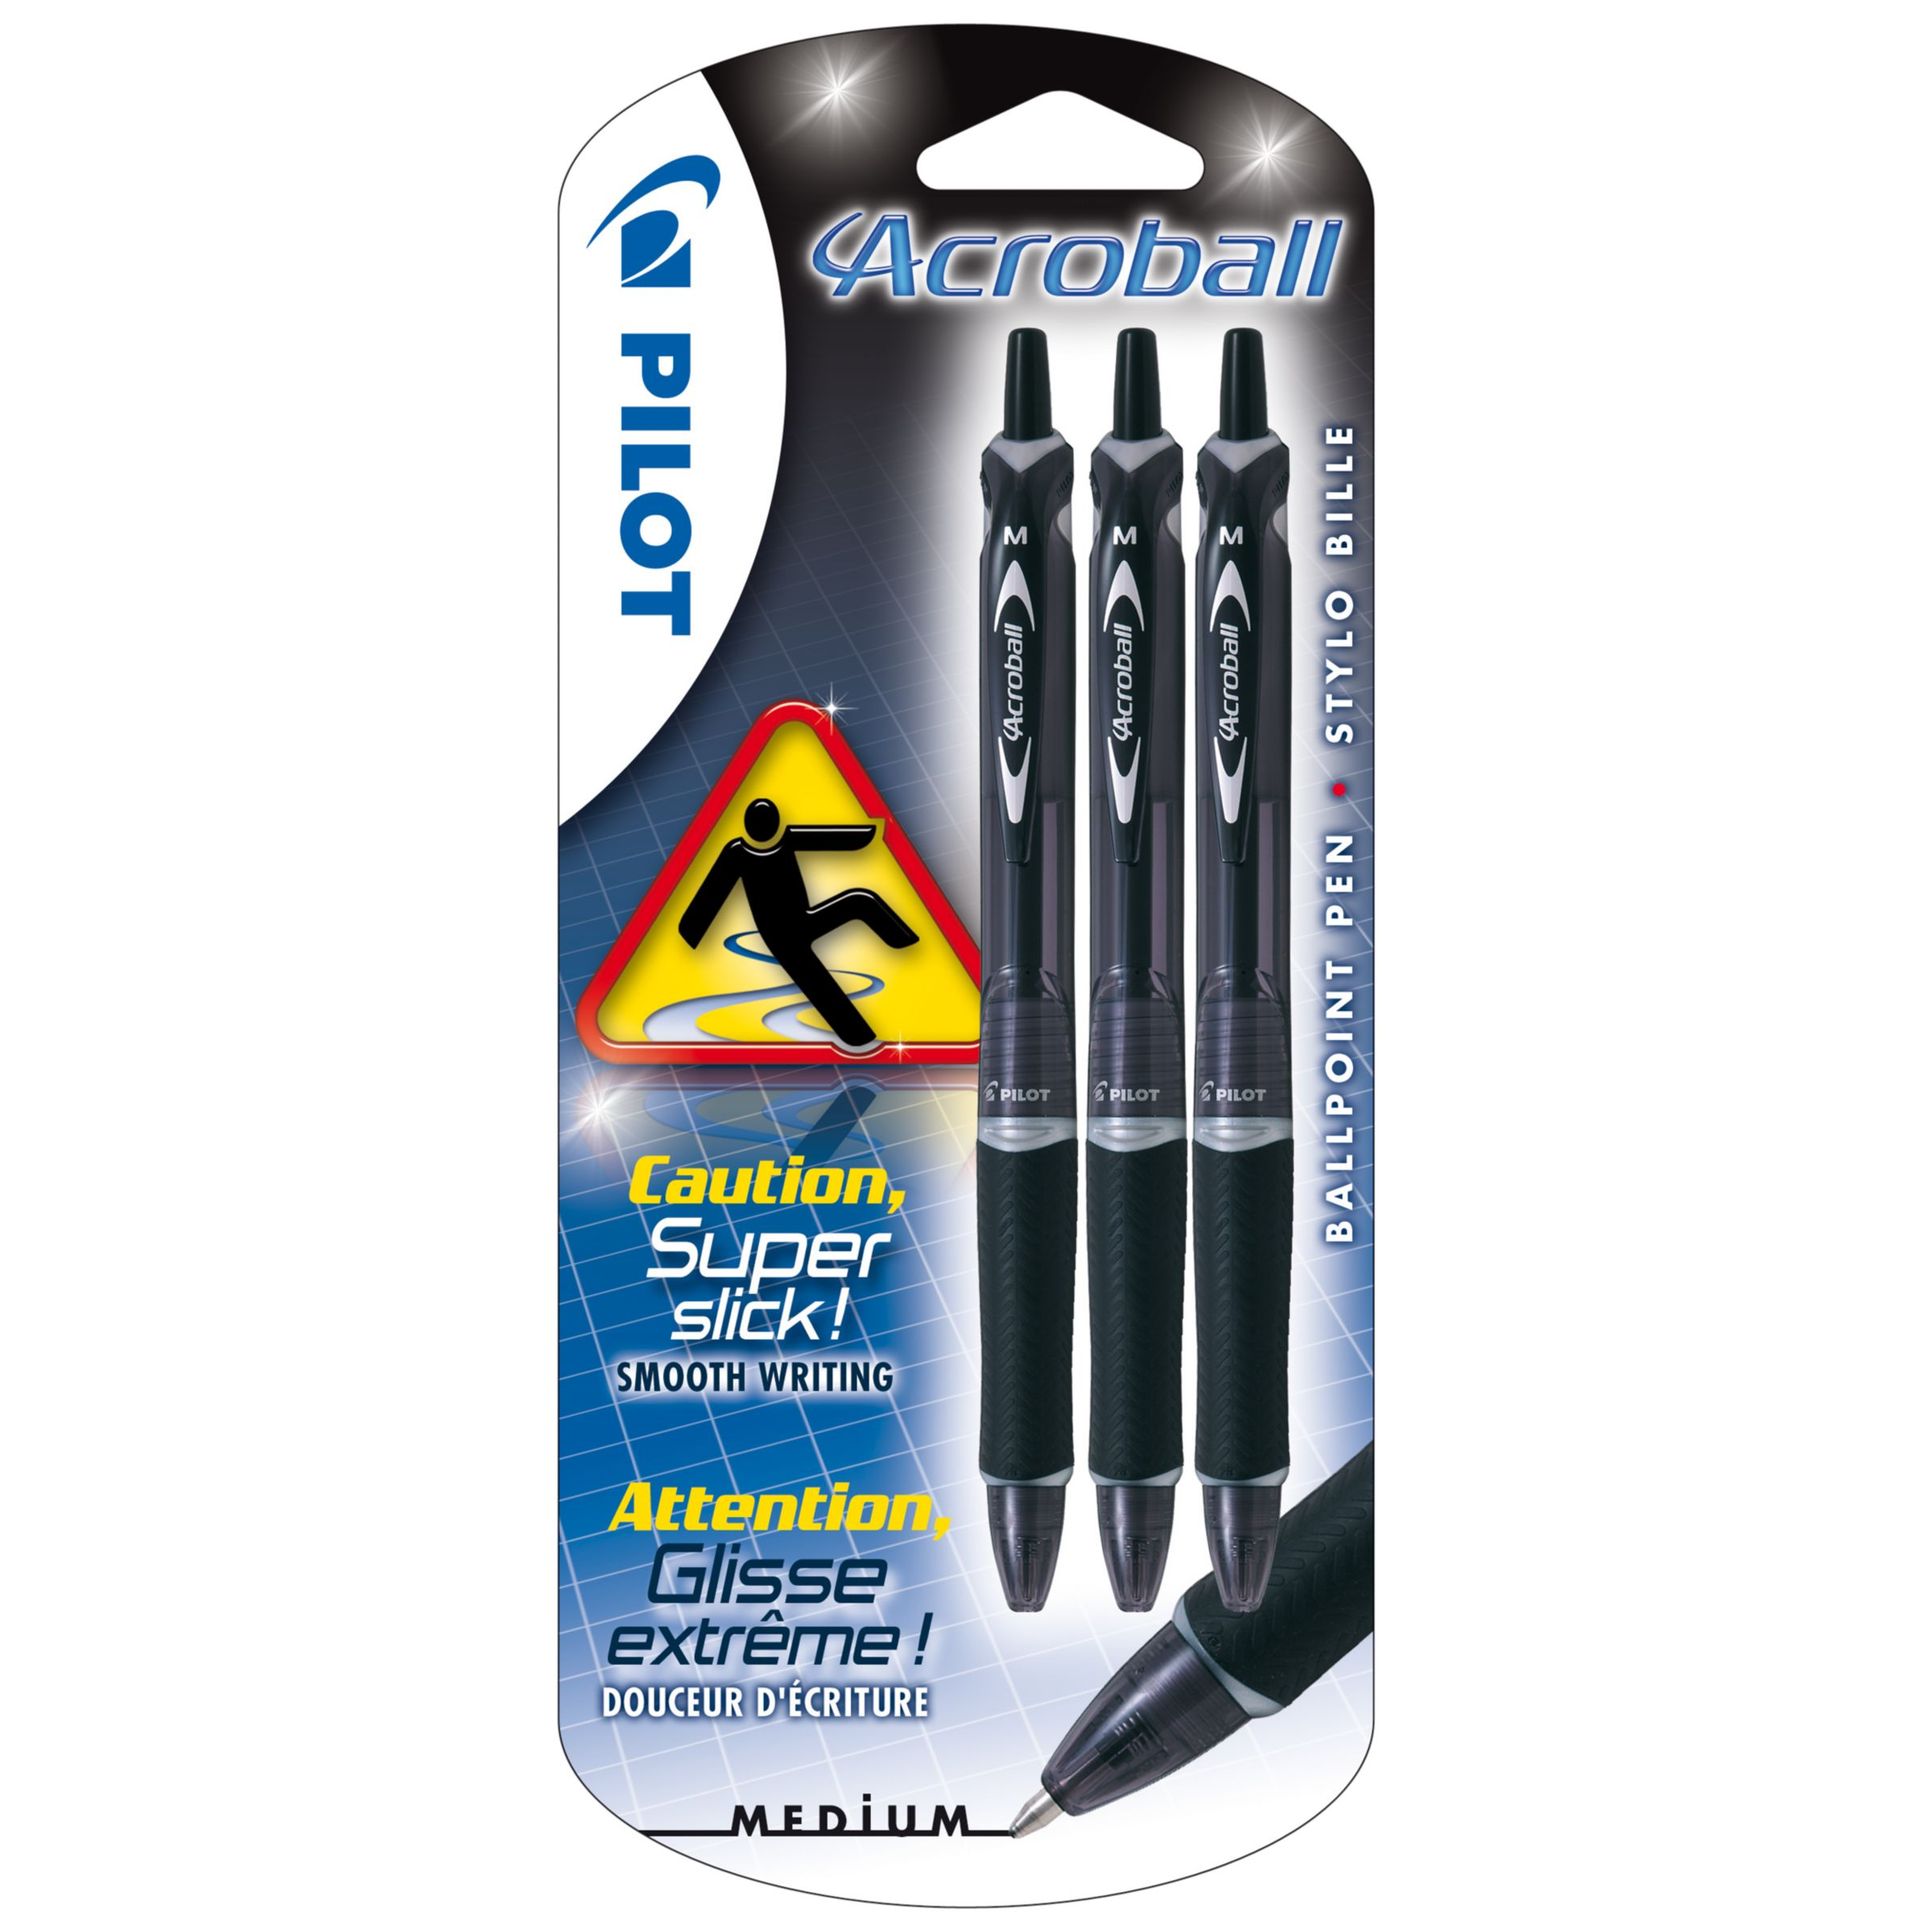 Pilot Pen Pilot Acroball Ballpoint Pens, Pack of 3